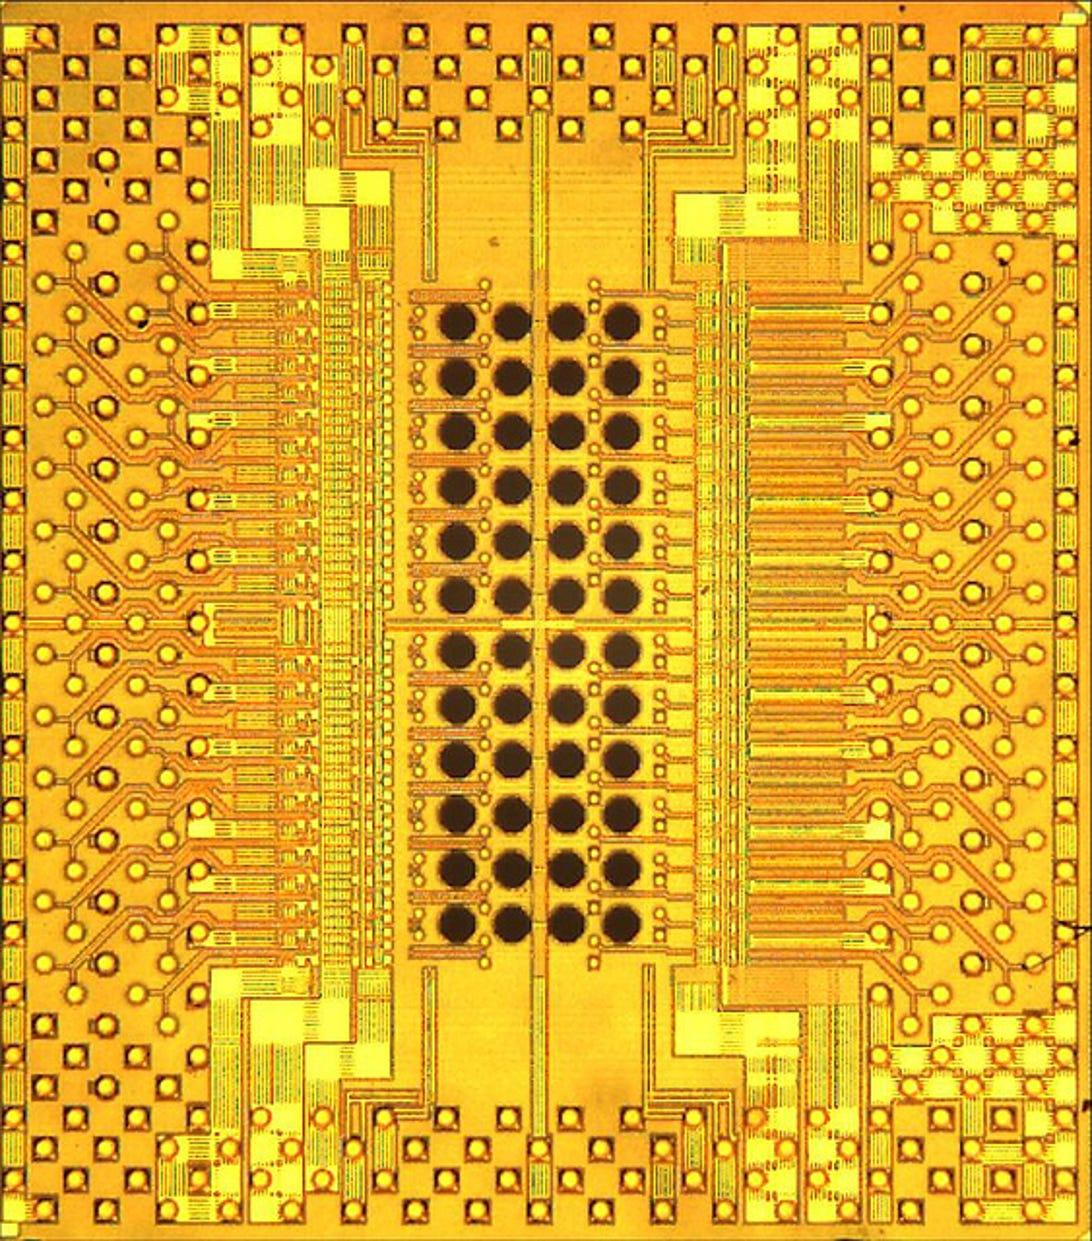 IBM_Trillion_1.jpg